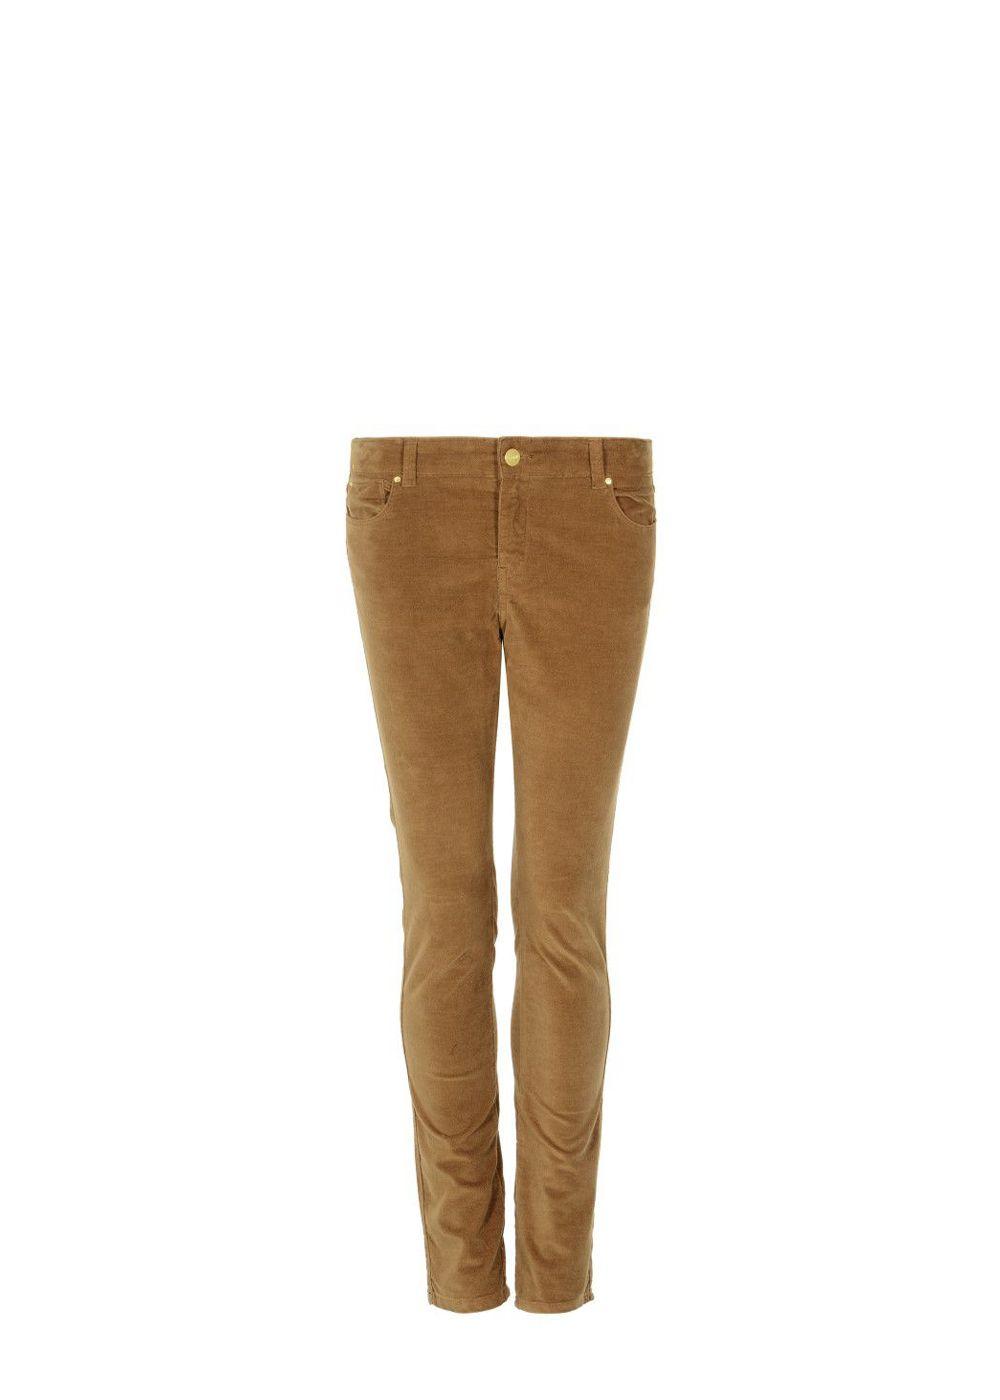 Spodnie damskie Auriga 1 SPODT-0001-24(Z16)